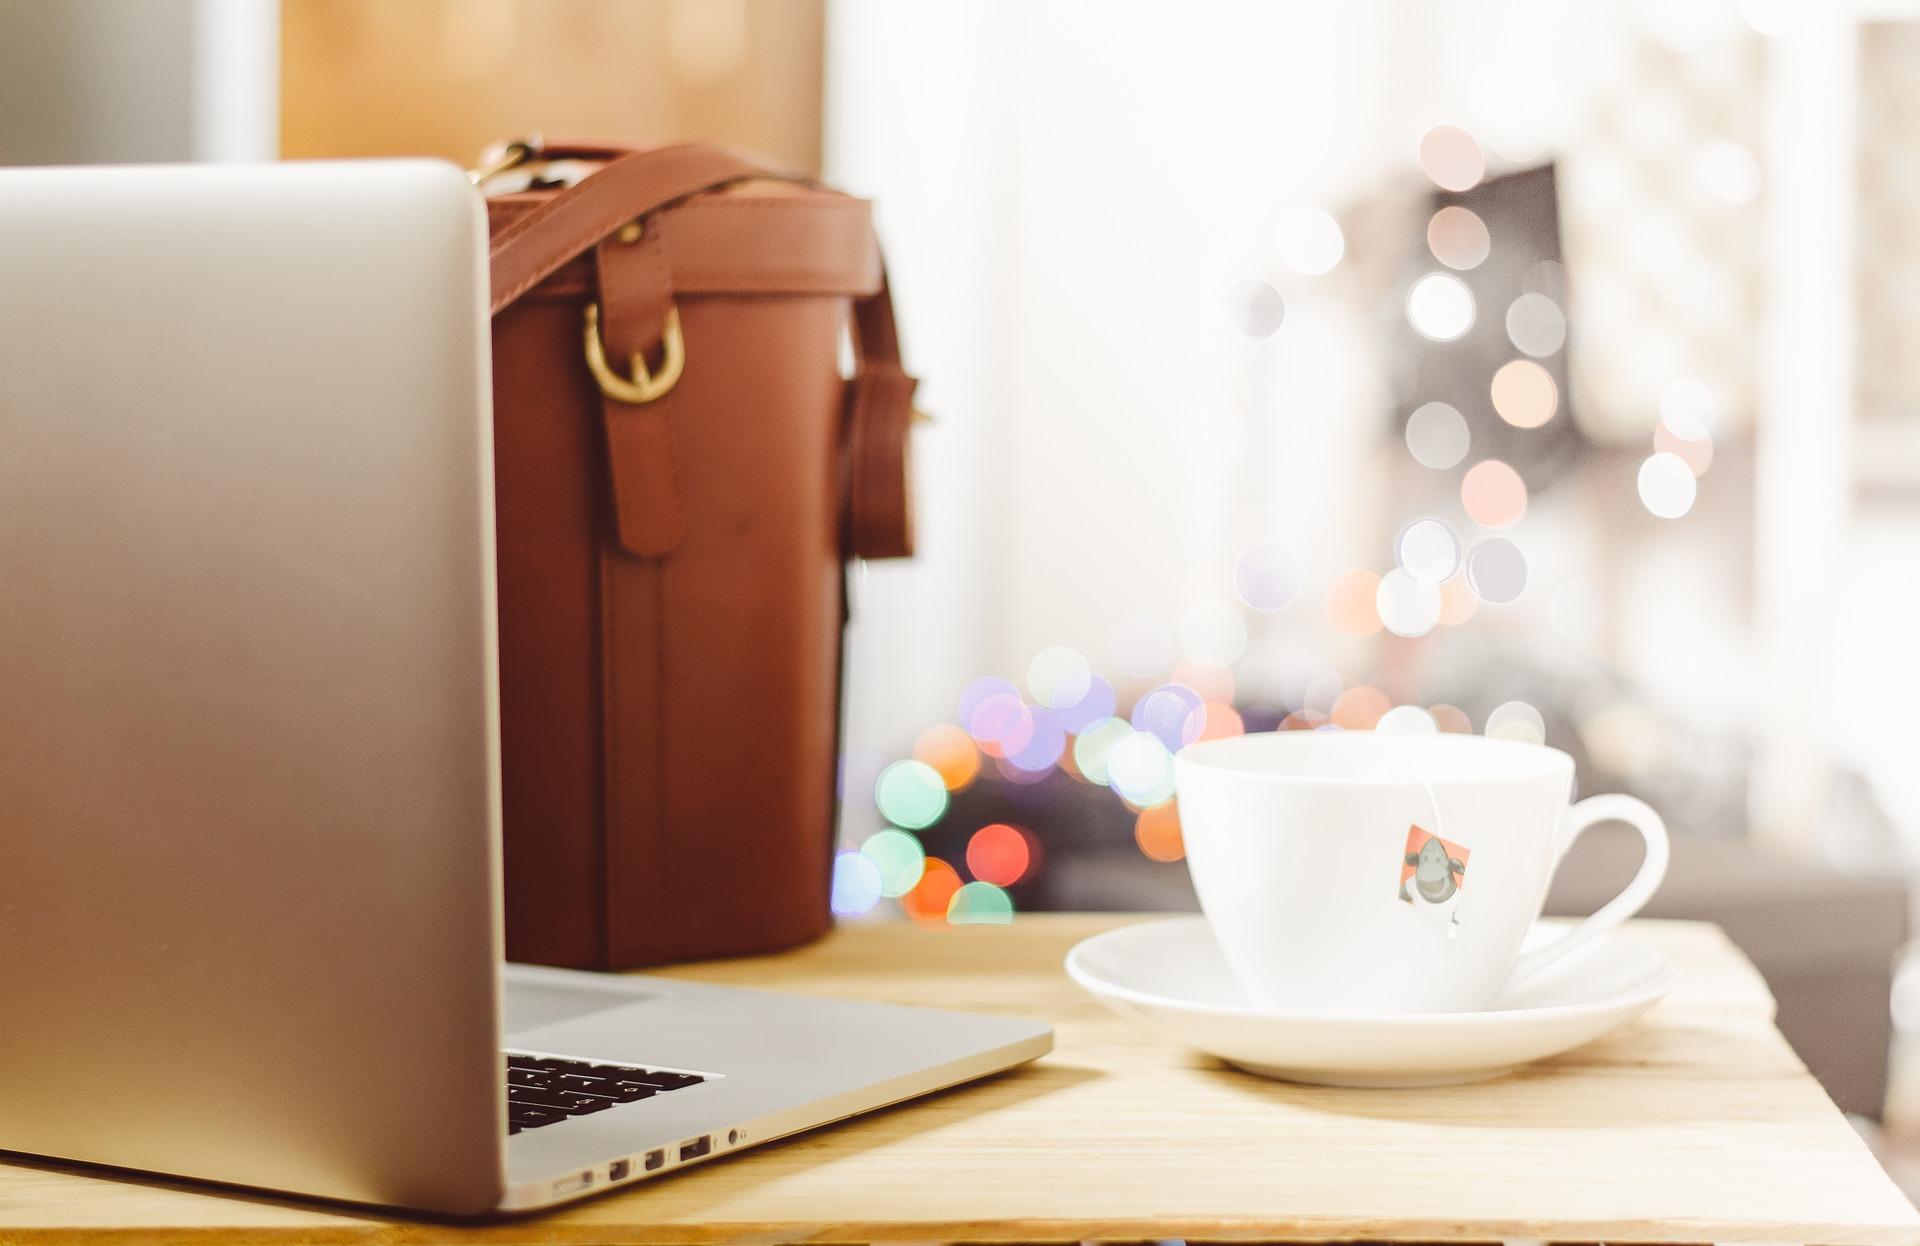 desk-laptop-bag-transportation expenses in retirement